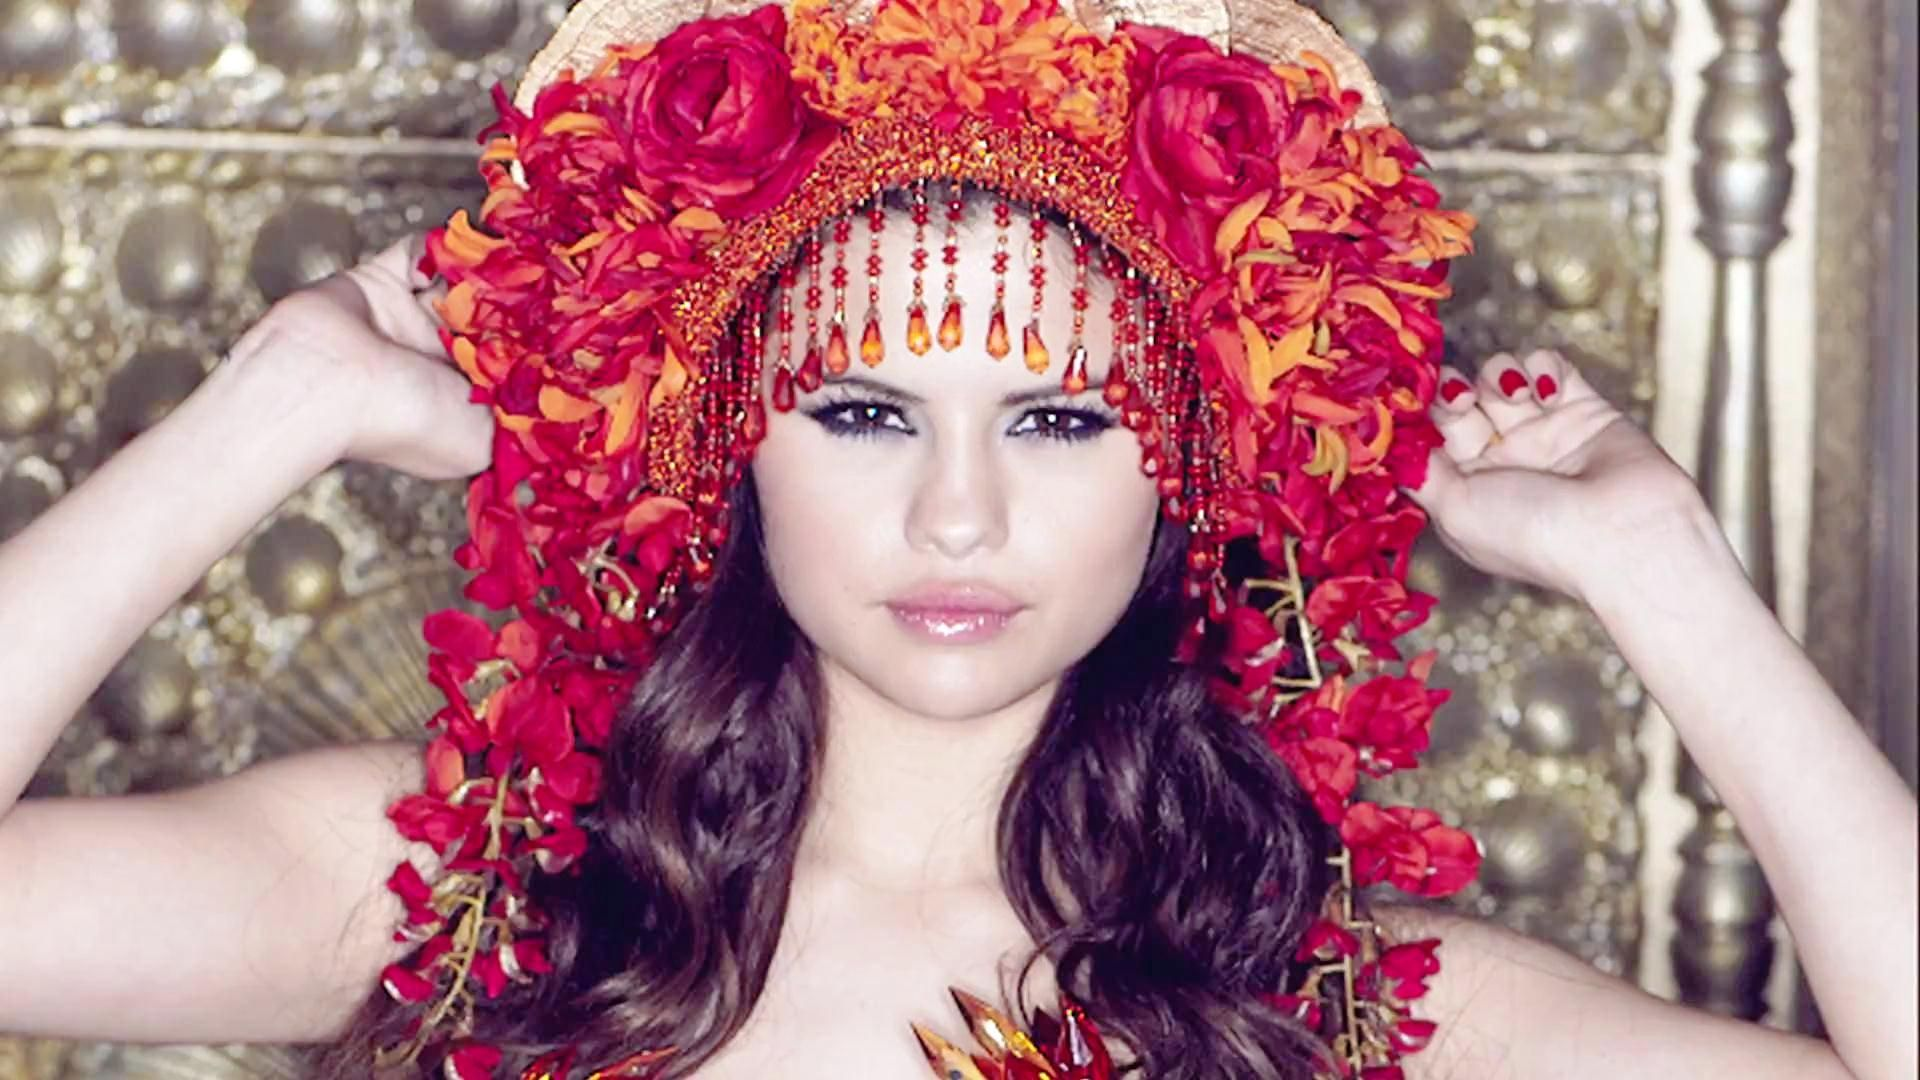 Selena Gomez Come and Get It HD wallpaper 11   Apnatimepasscom 1920x1080